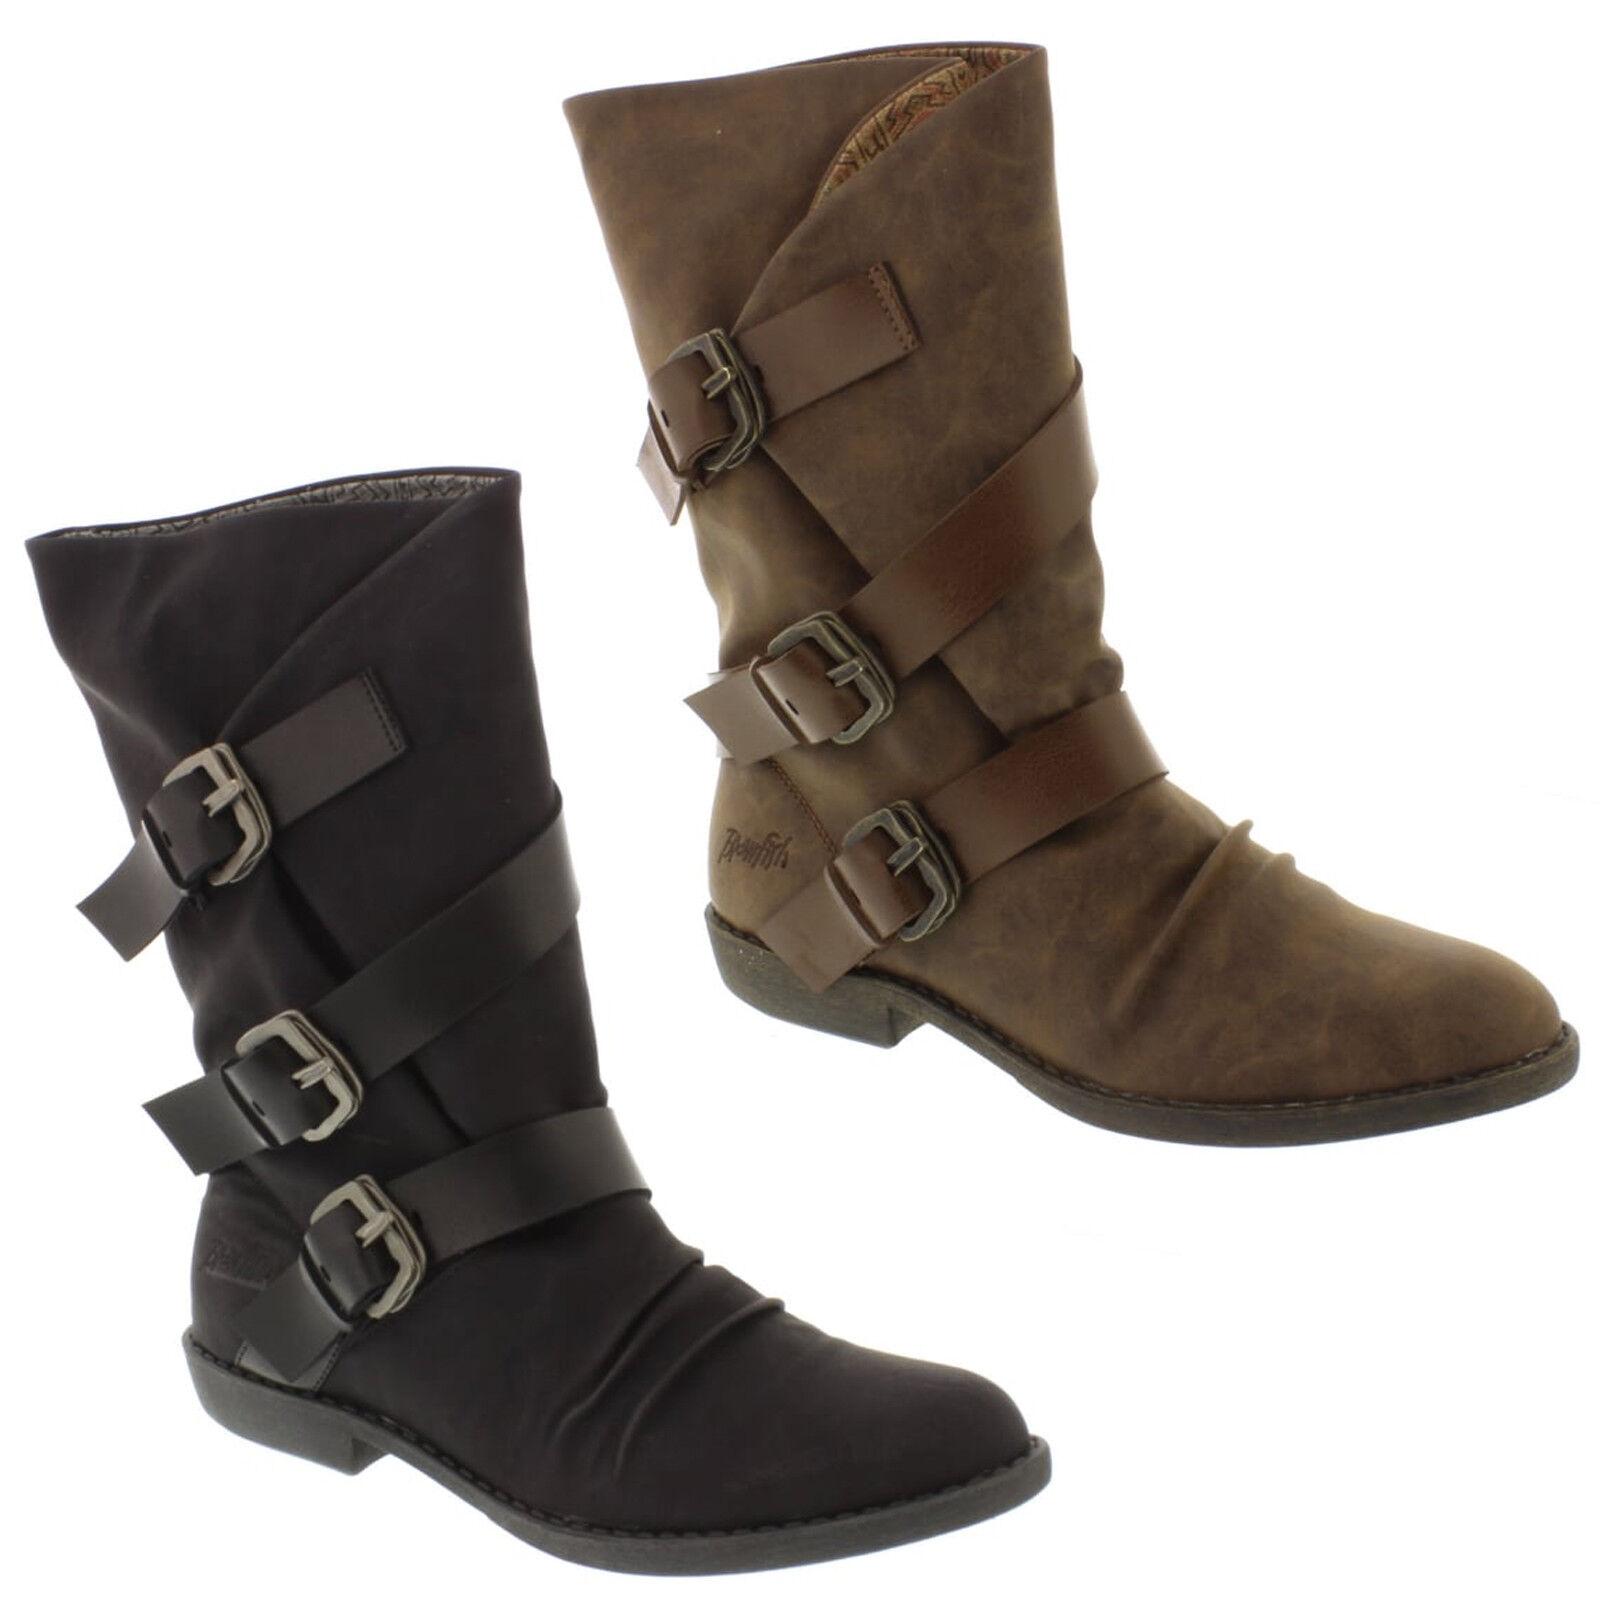 Blowfish Malibu Alms Boots Womens Tall Buckle Detail Winter Heeled Shoes